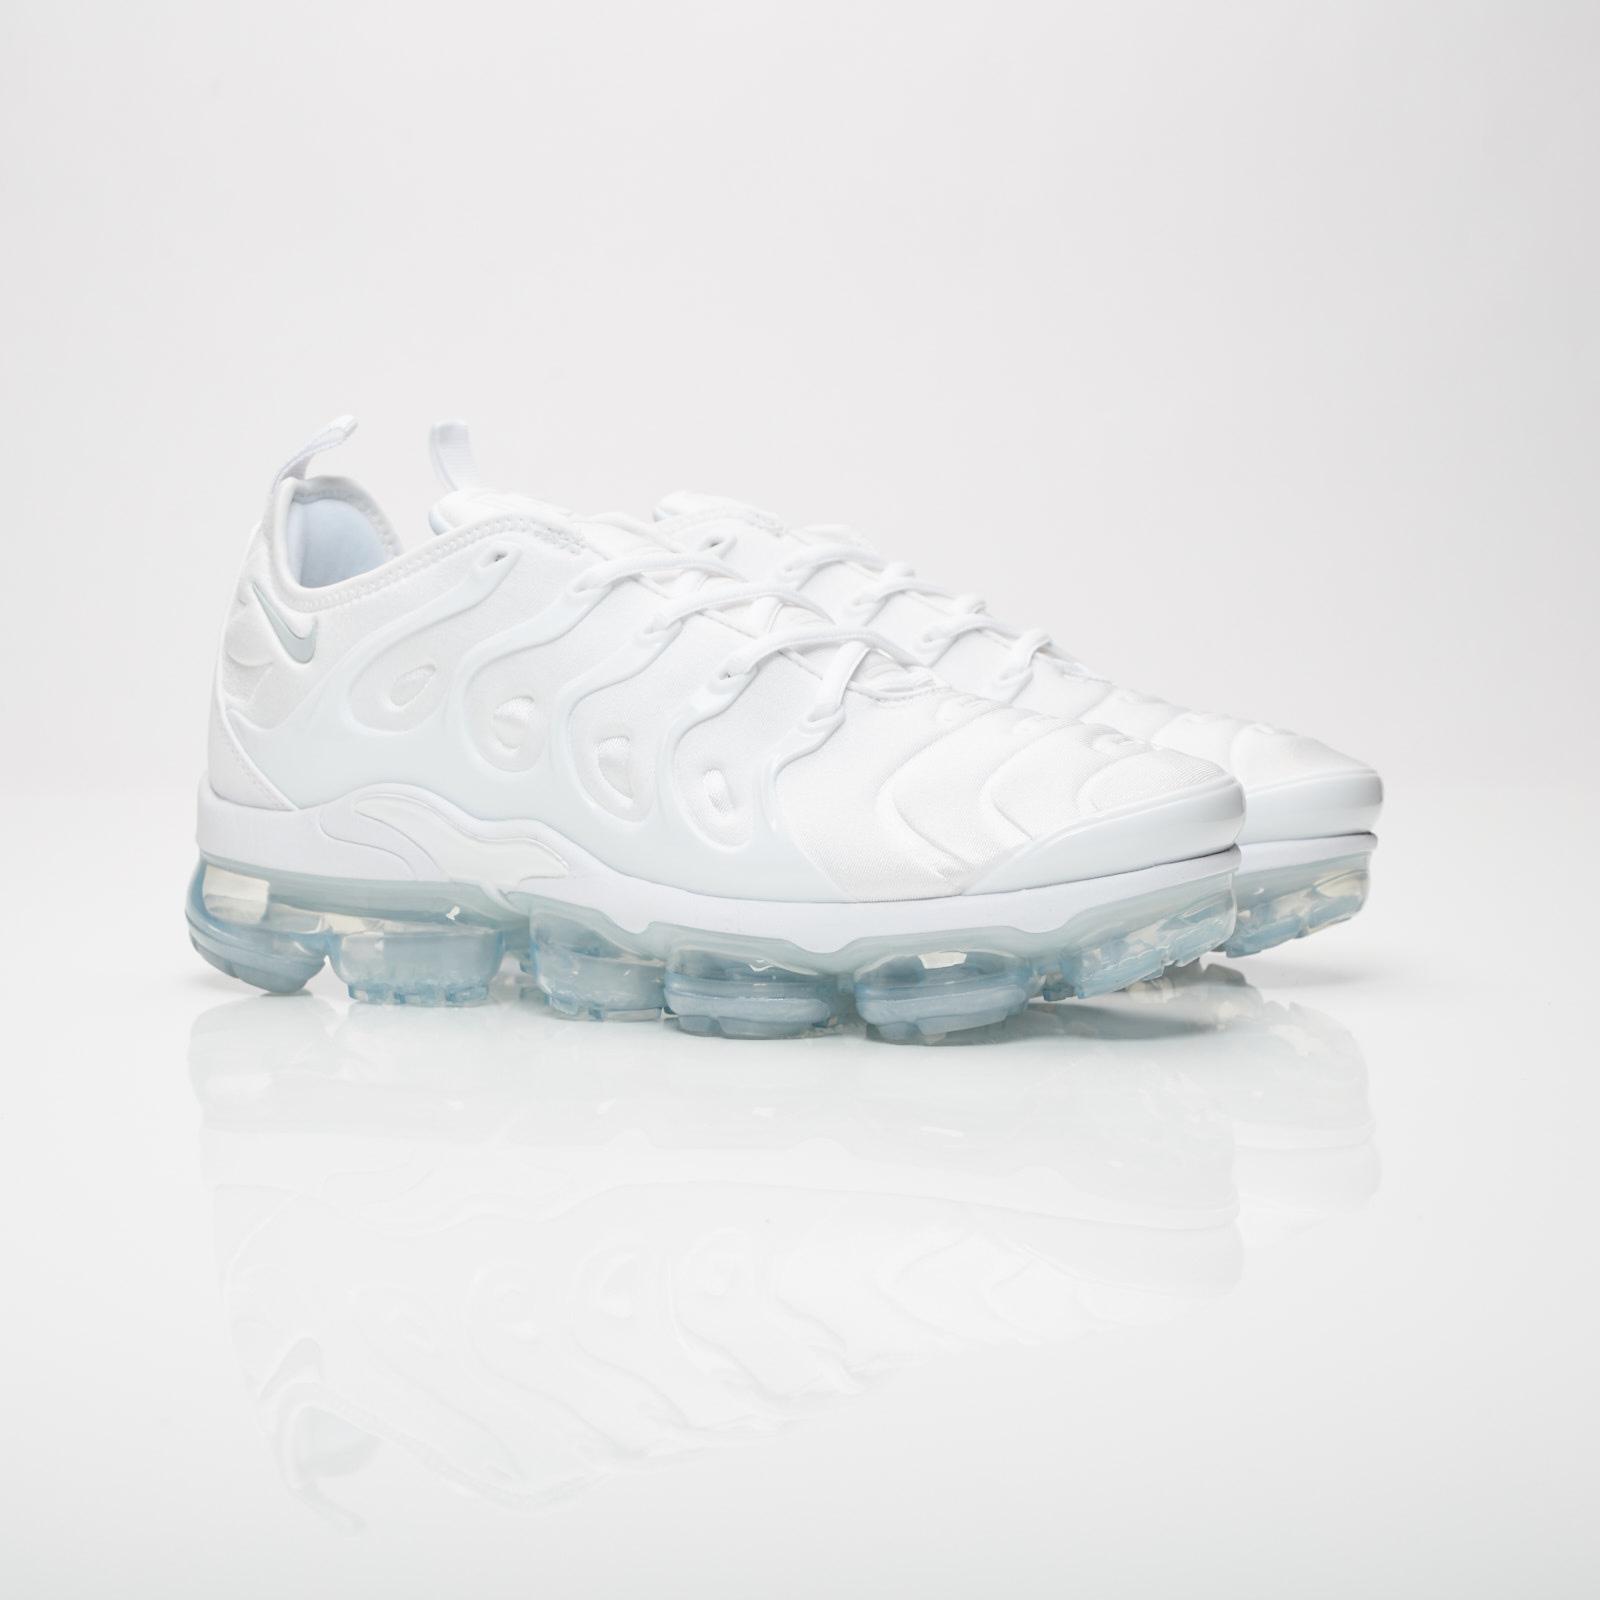 quality design 30ee2 36f43 Nike Sportswear Air Vapormax Plus